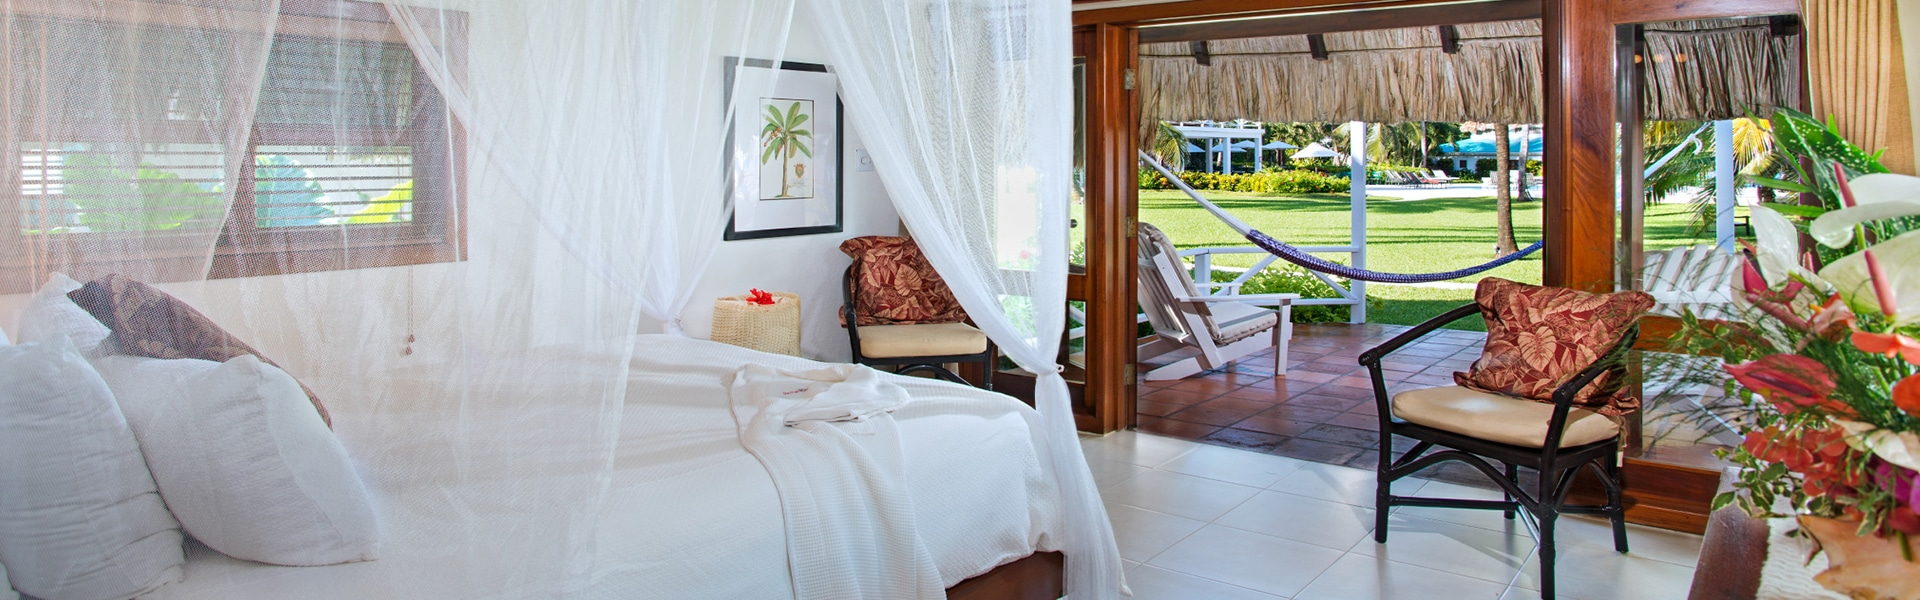 Victoria house beach resort housekeeping